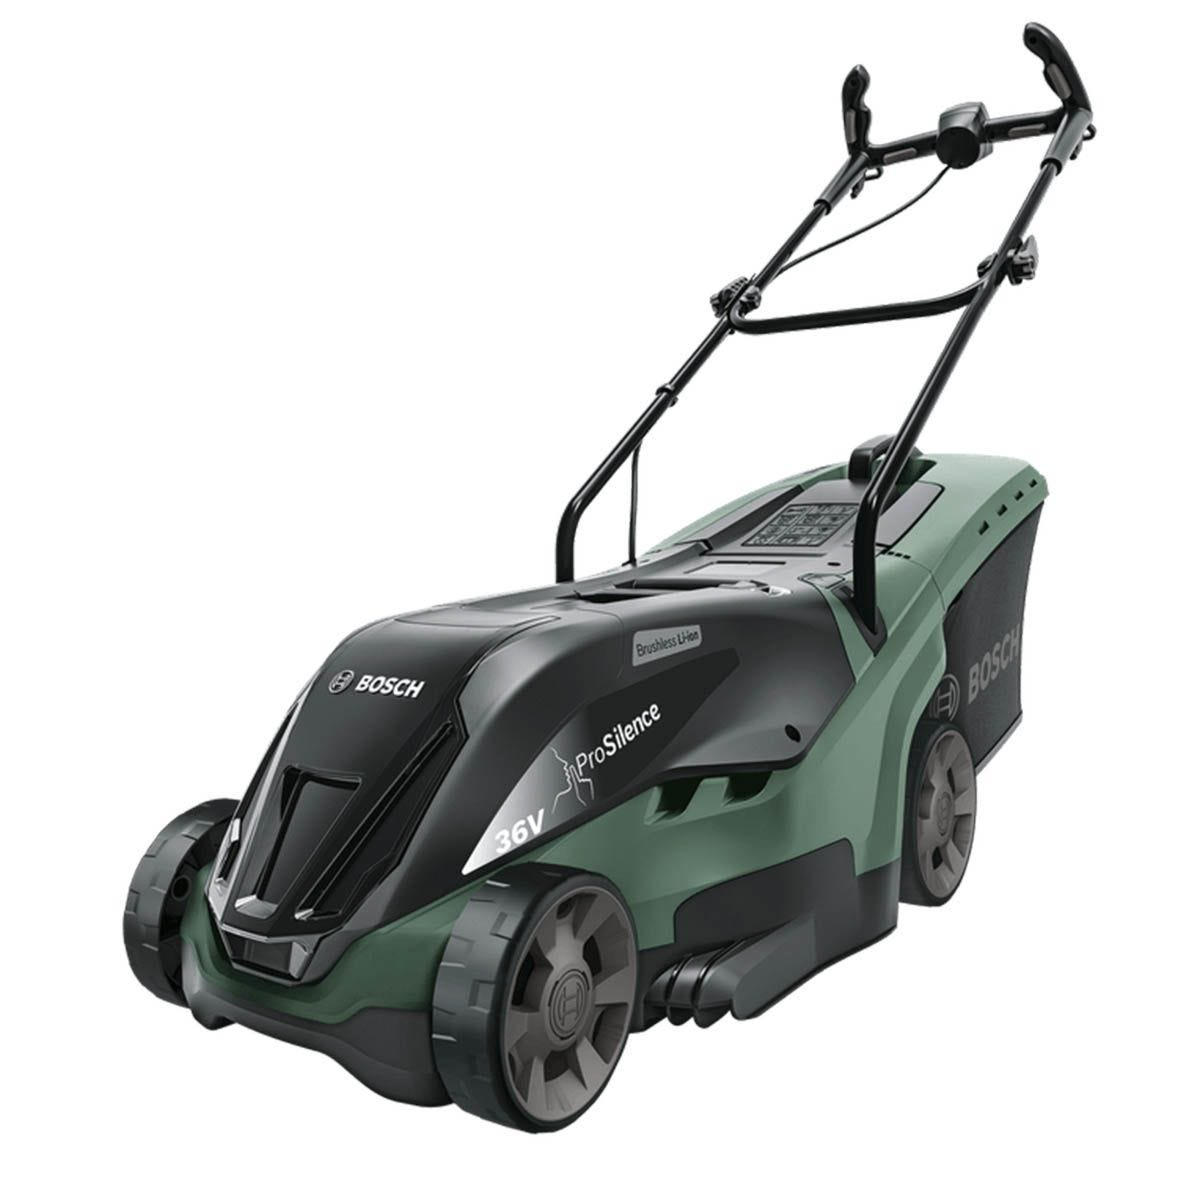 Bosch UniversalRotak 36-550 Cordless Lawnmower (1x 4.0Ah)